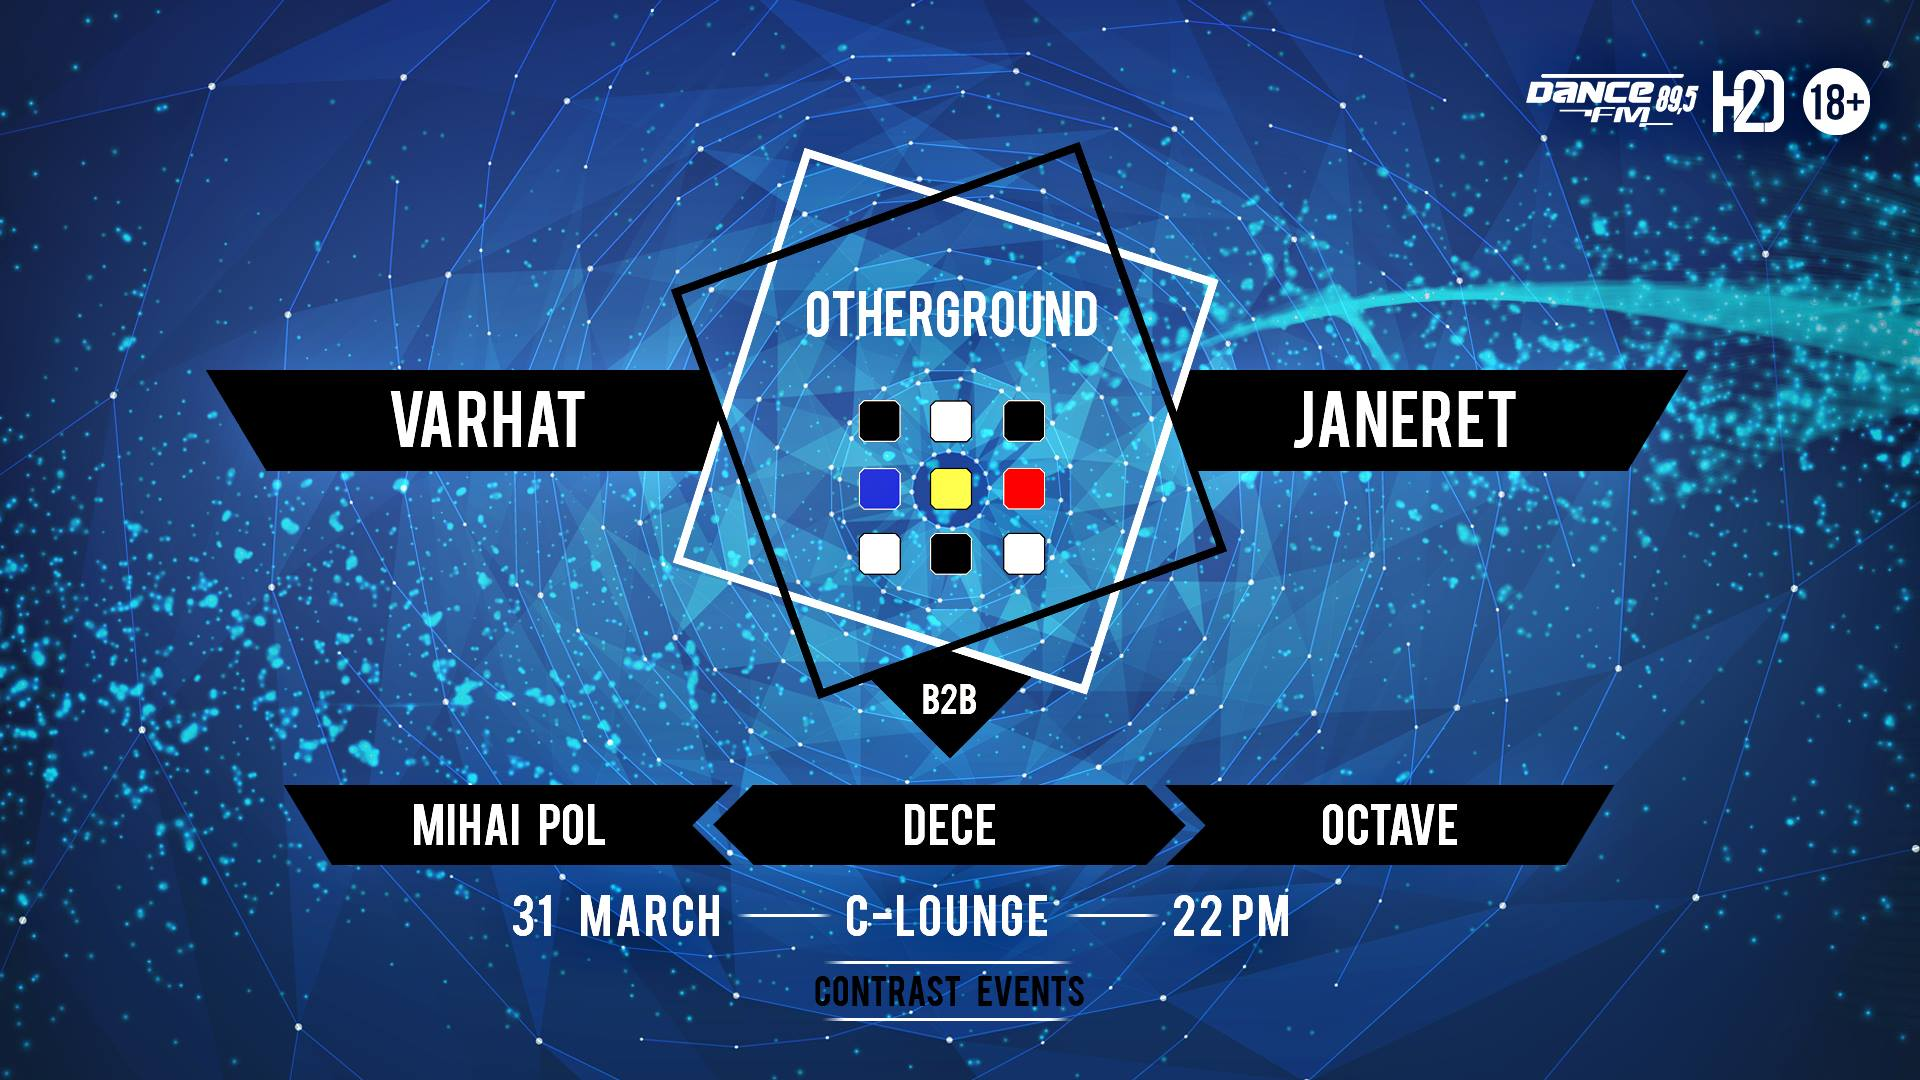 Otherground w. Varhat b2b Janeret x Mihai Pol x Octave x Dece.